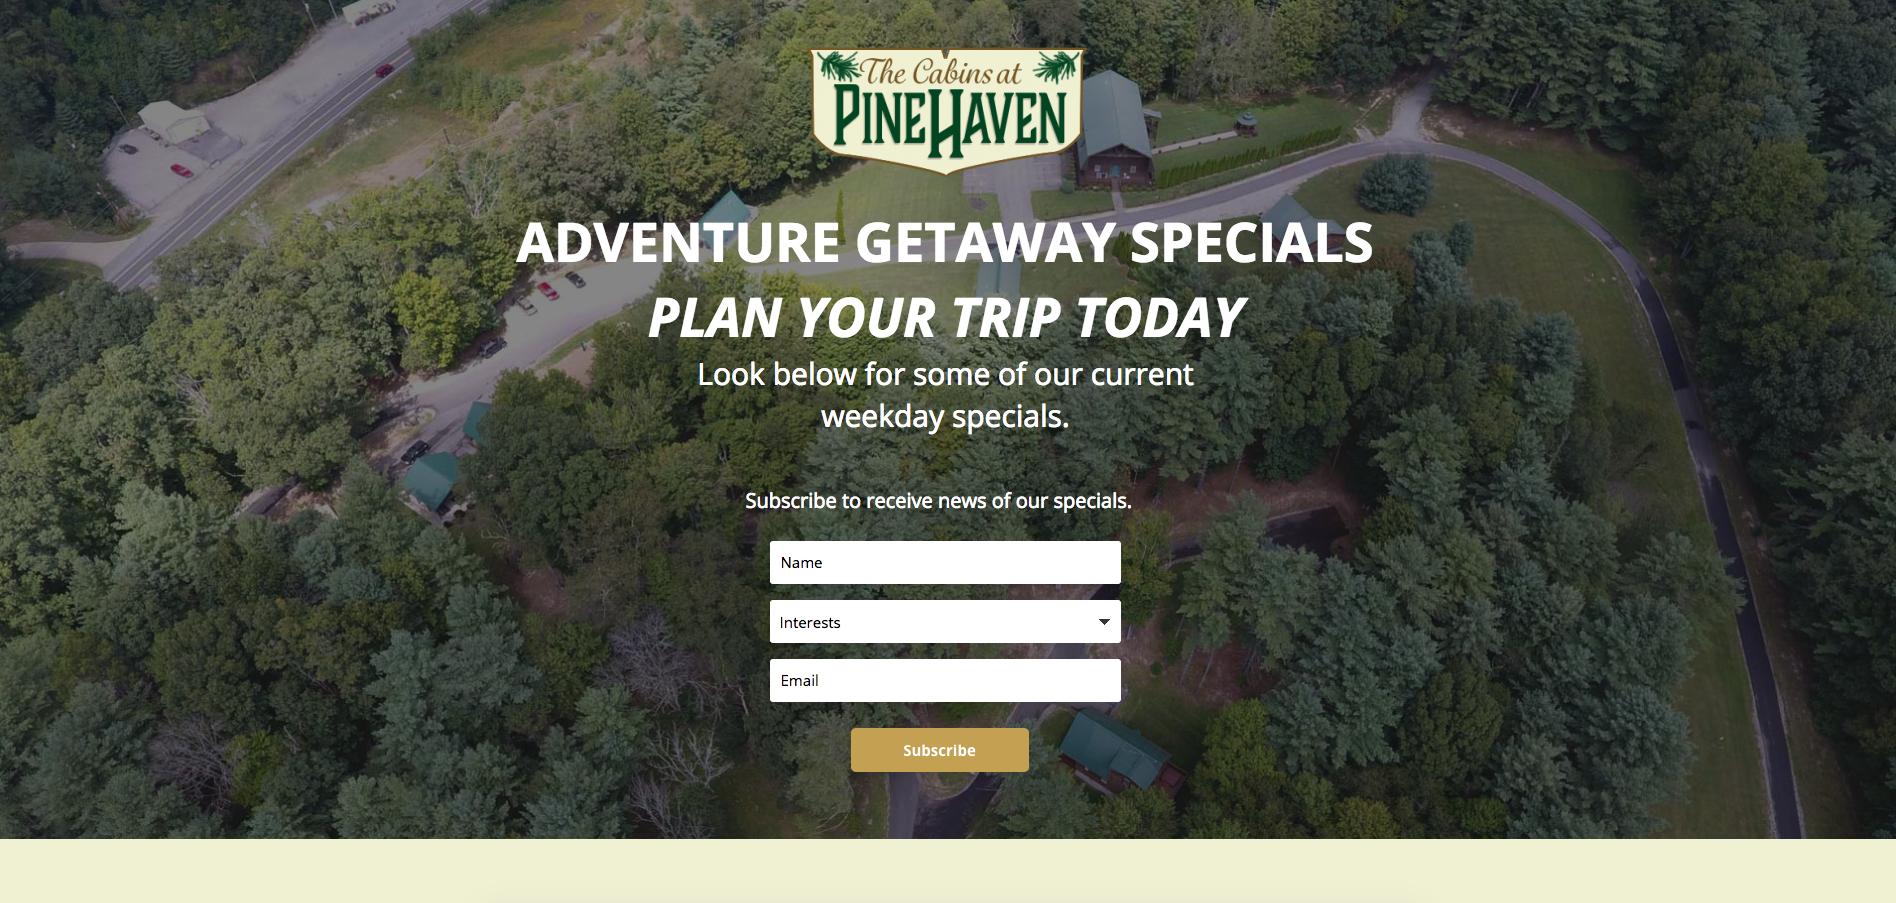 Cabsins at Pine Haven Facebook Marketing Cucumber & Co WV Web Design